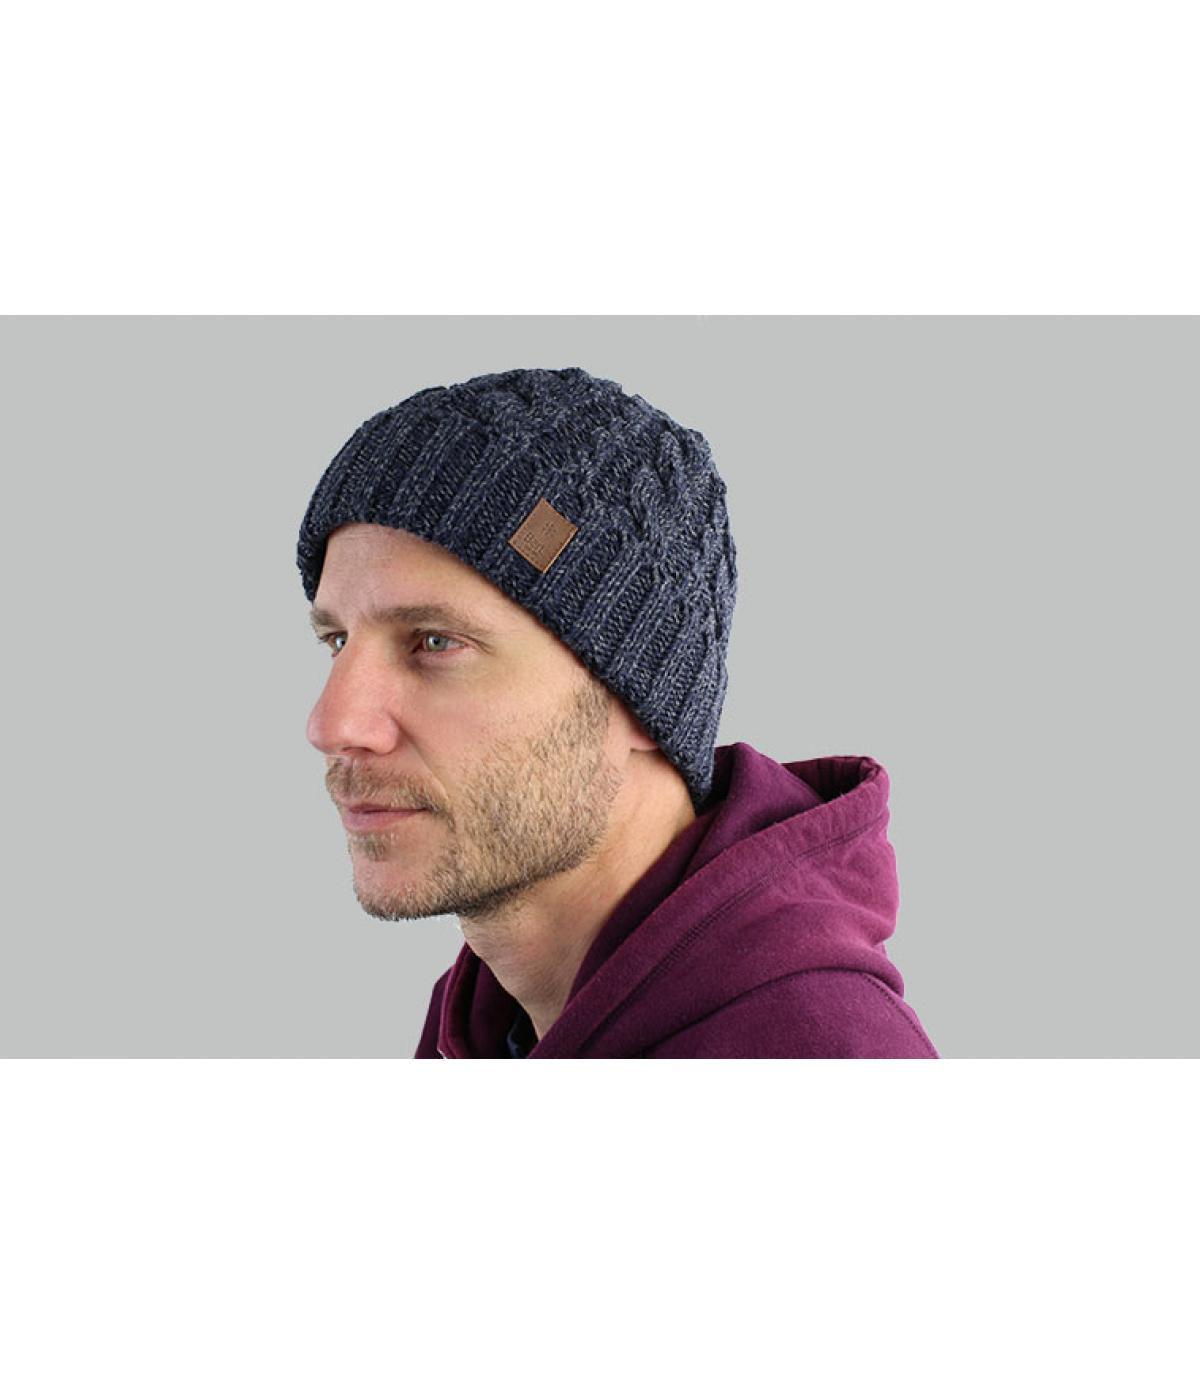 Mütze Revers marineblau Zopfmuster